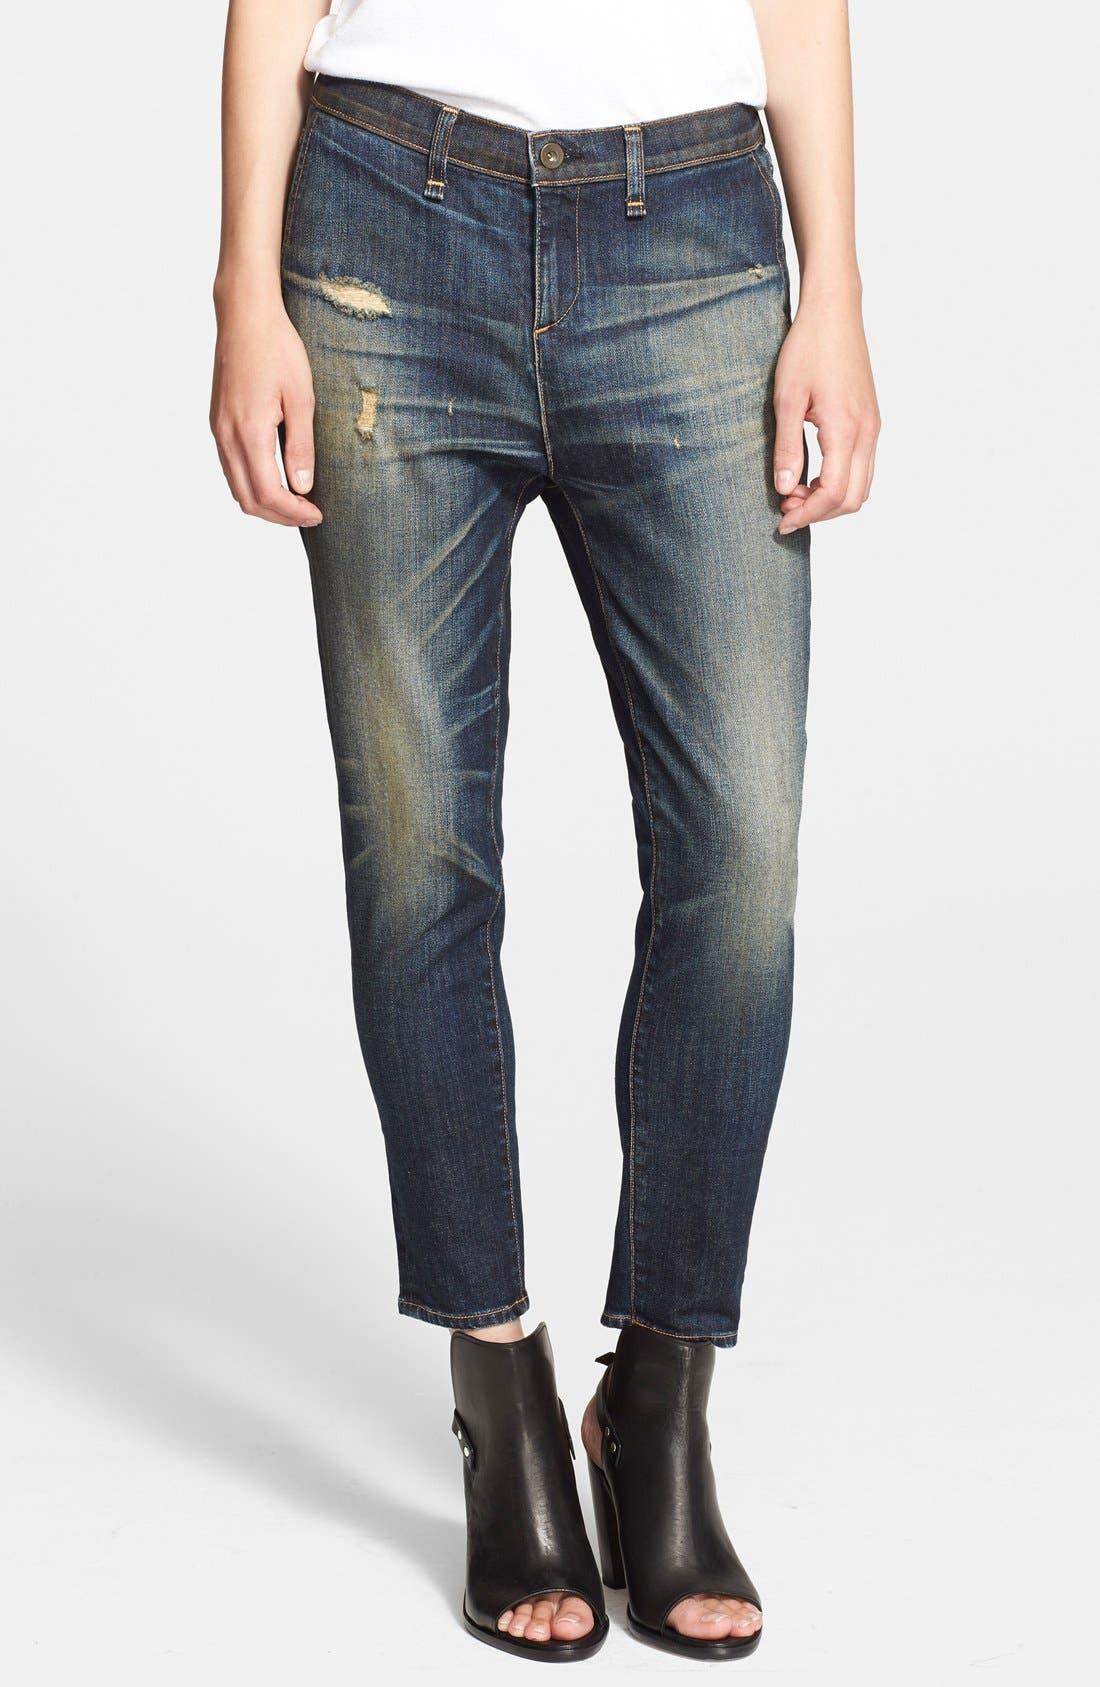 Alternate Image 1 Selected - rag & bone/JEAN Boyfriend Jeans (Mateos)